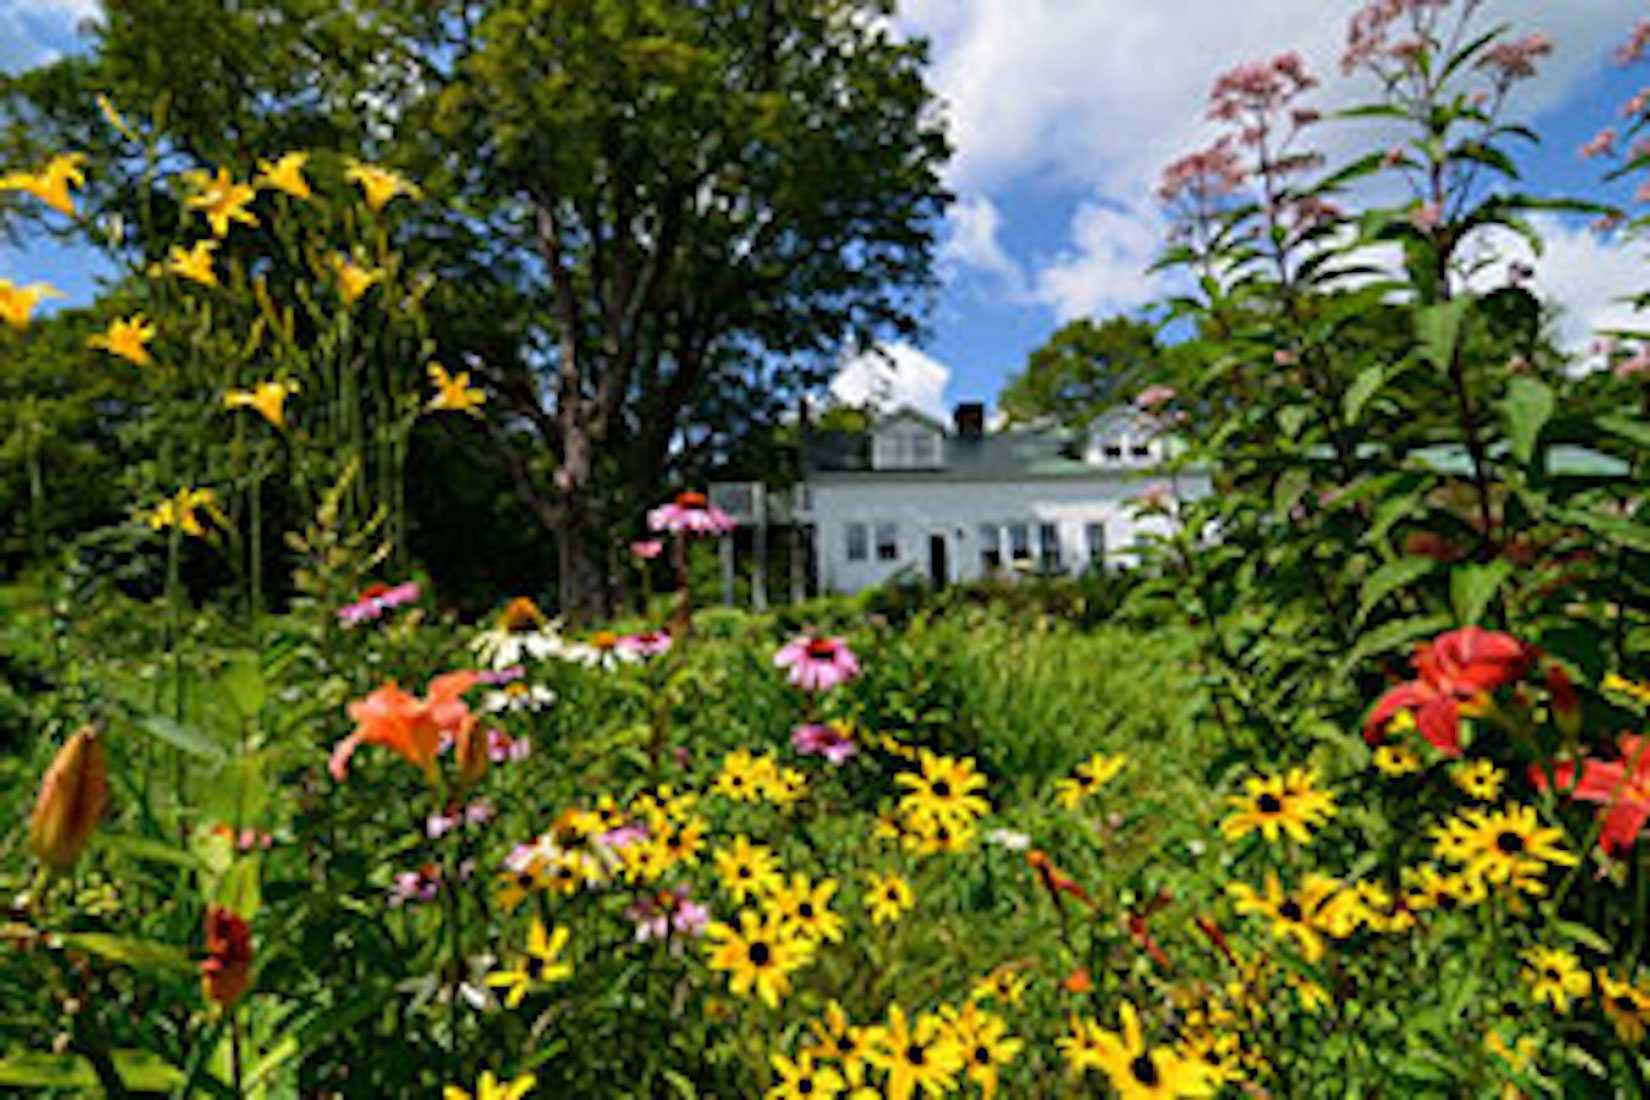 A close up of a flower garden at Flower Hill Farm Bed & Breakfast Retreat.